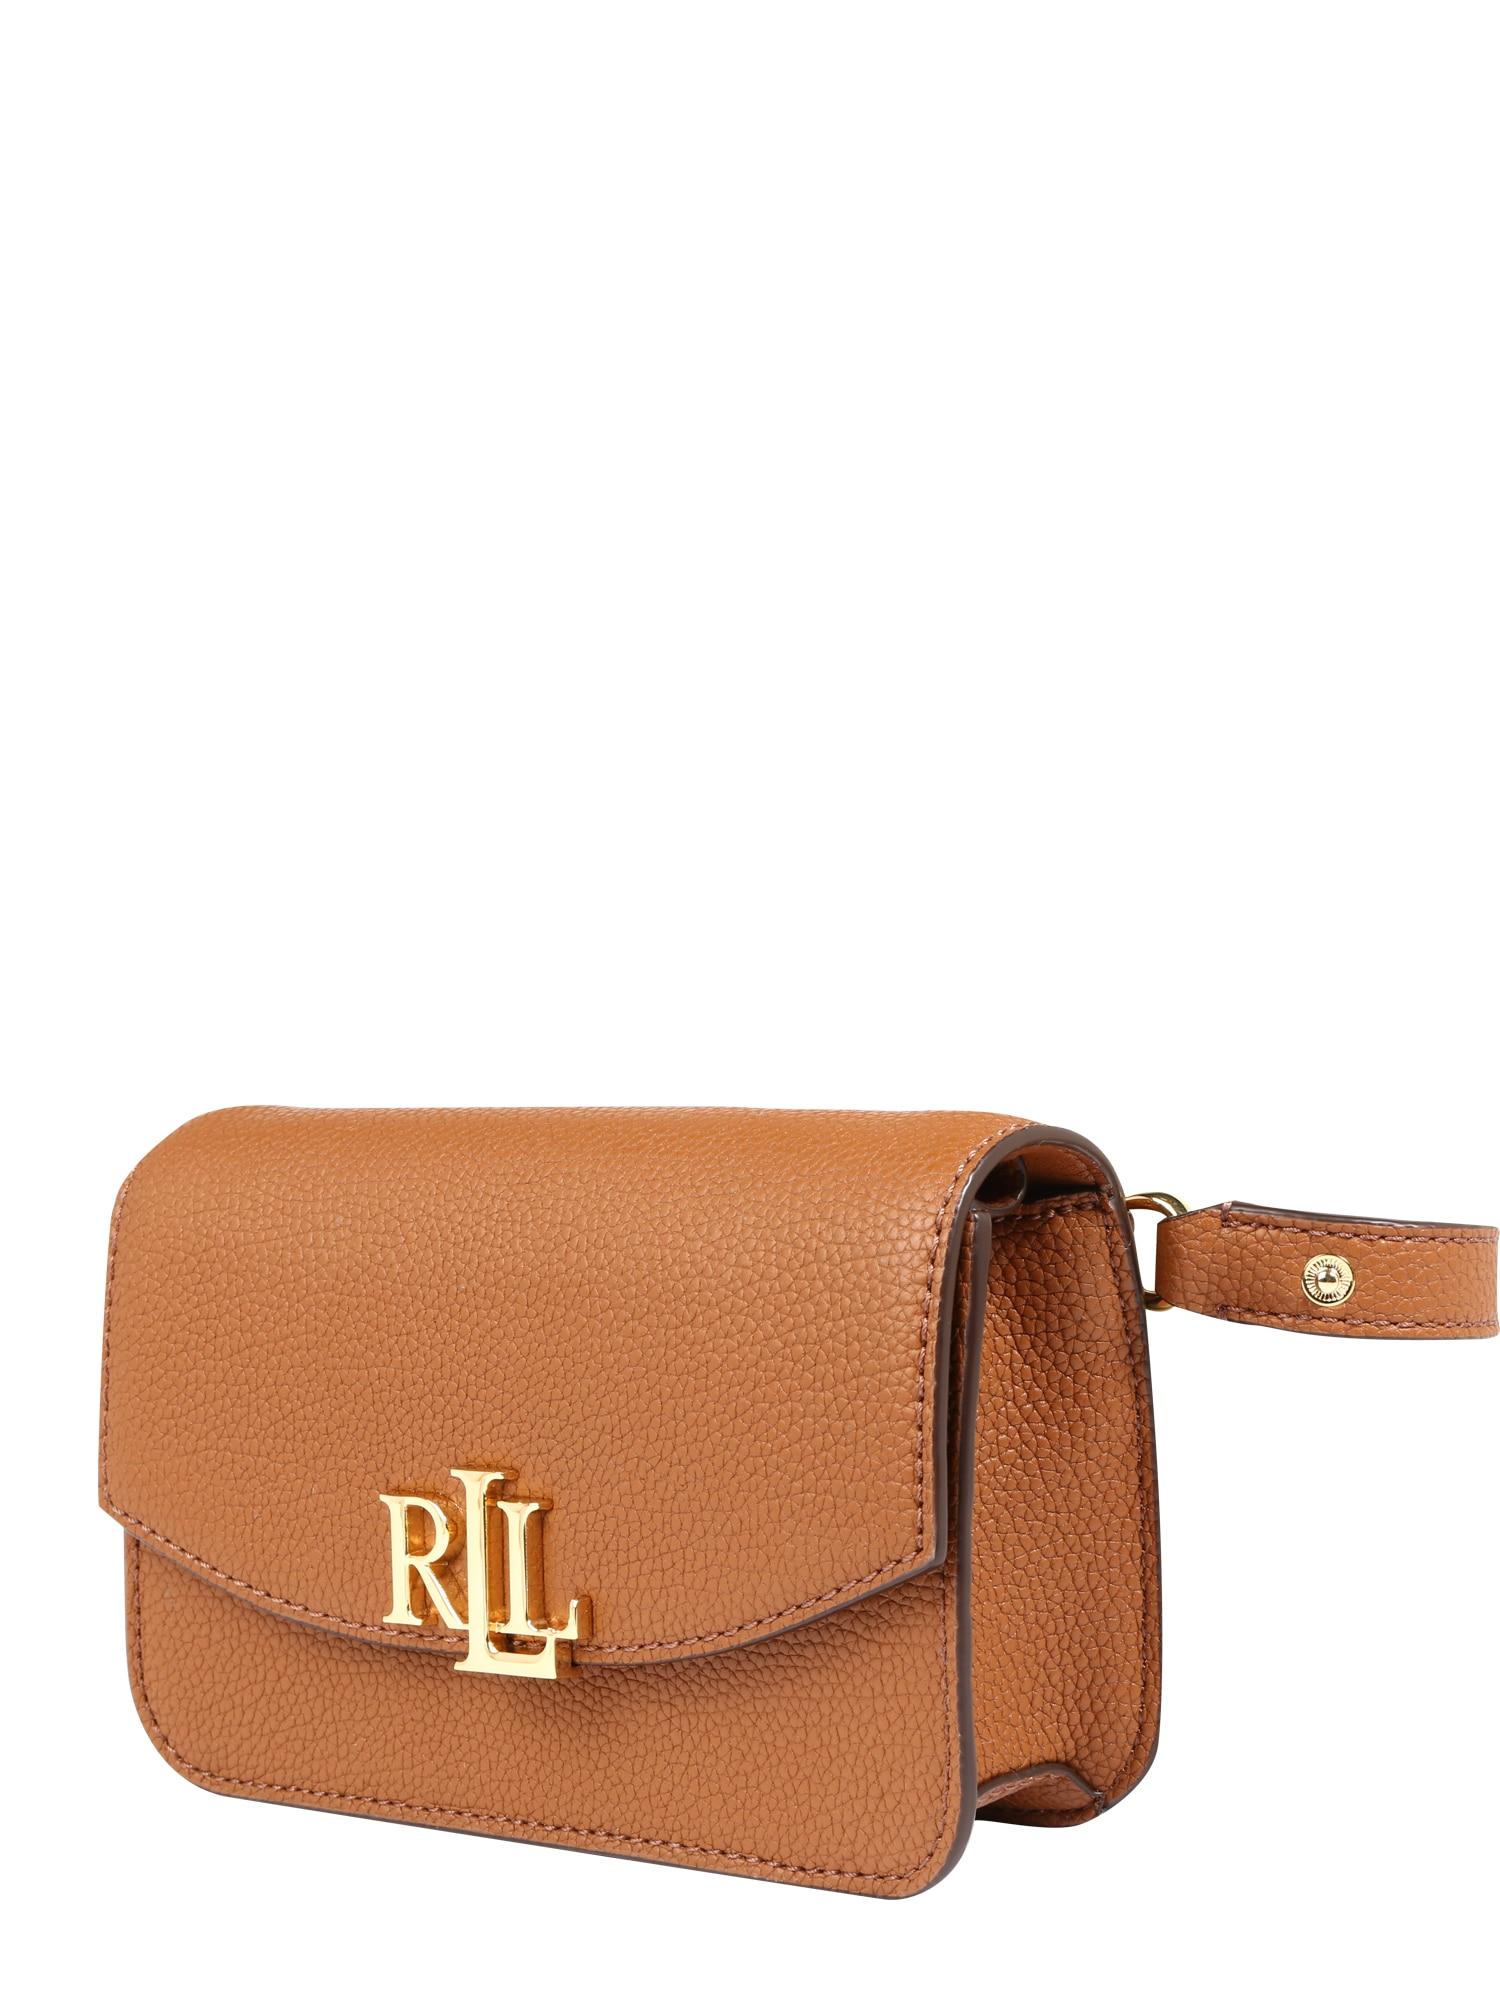 Taška přes rameno MADISON 18-CROSSBODY-SMALL koňaková Lauren Ralph Lauren